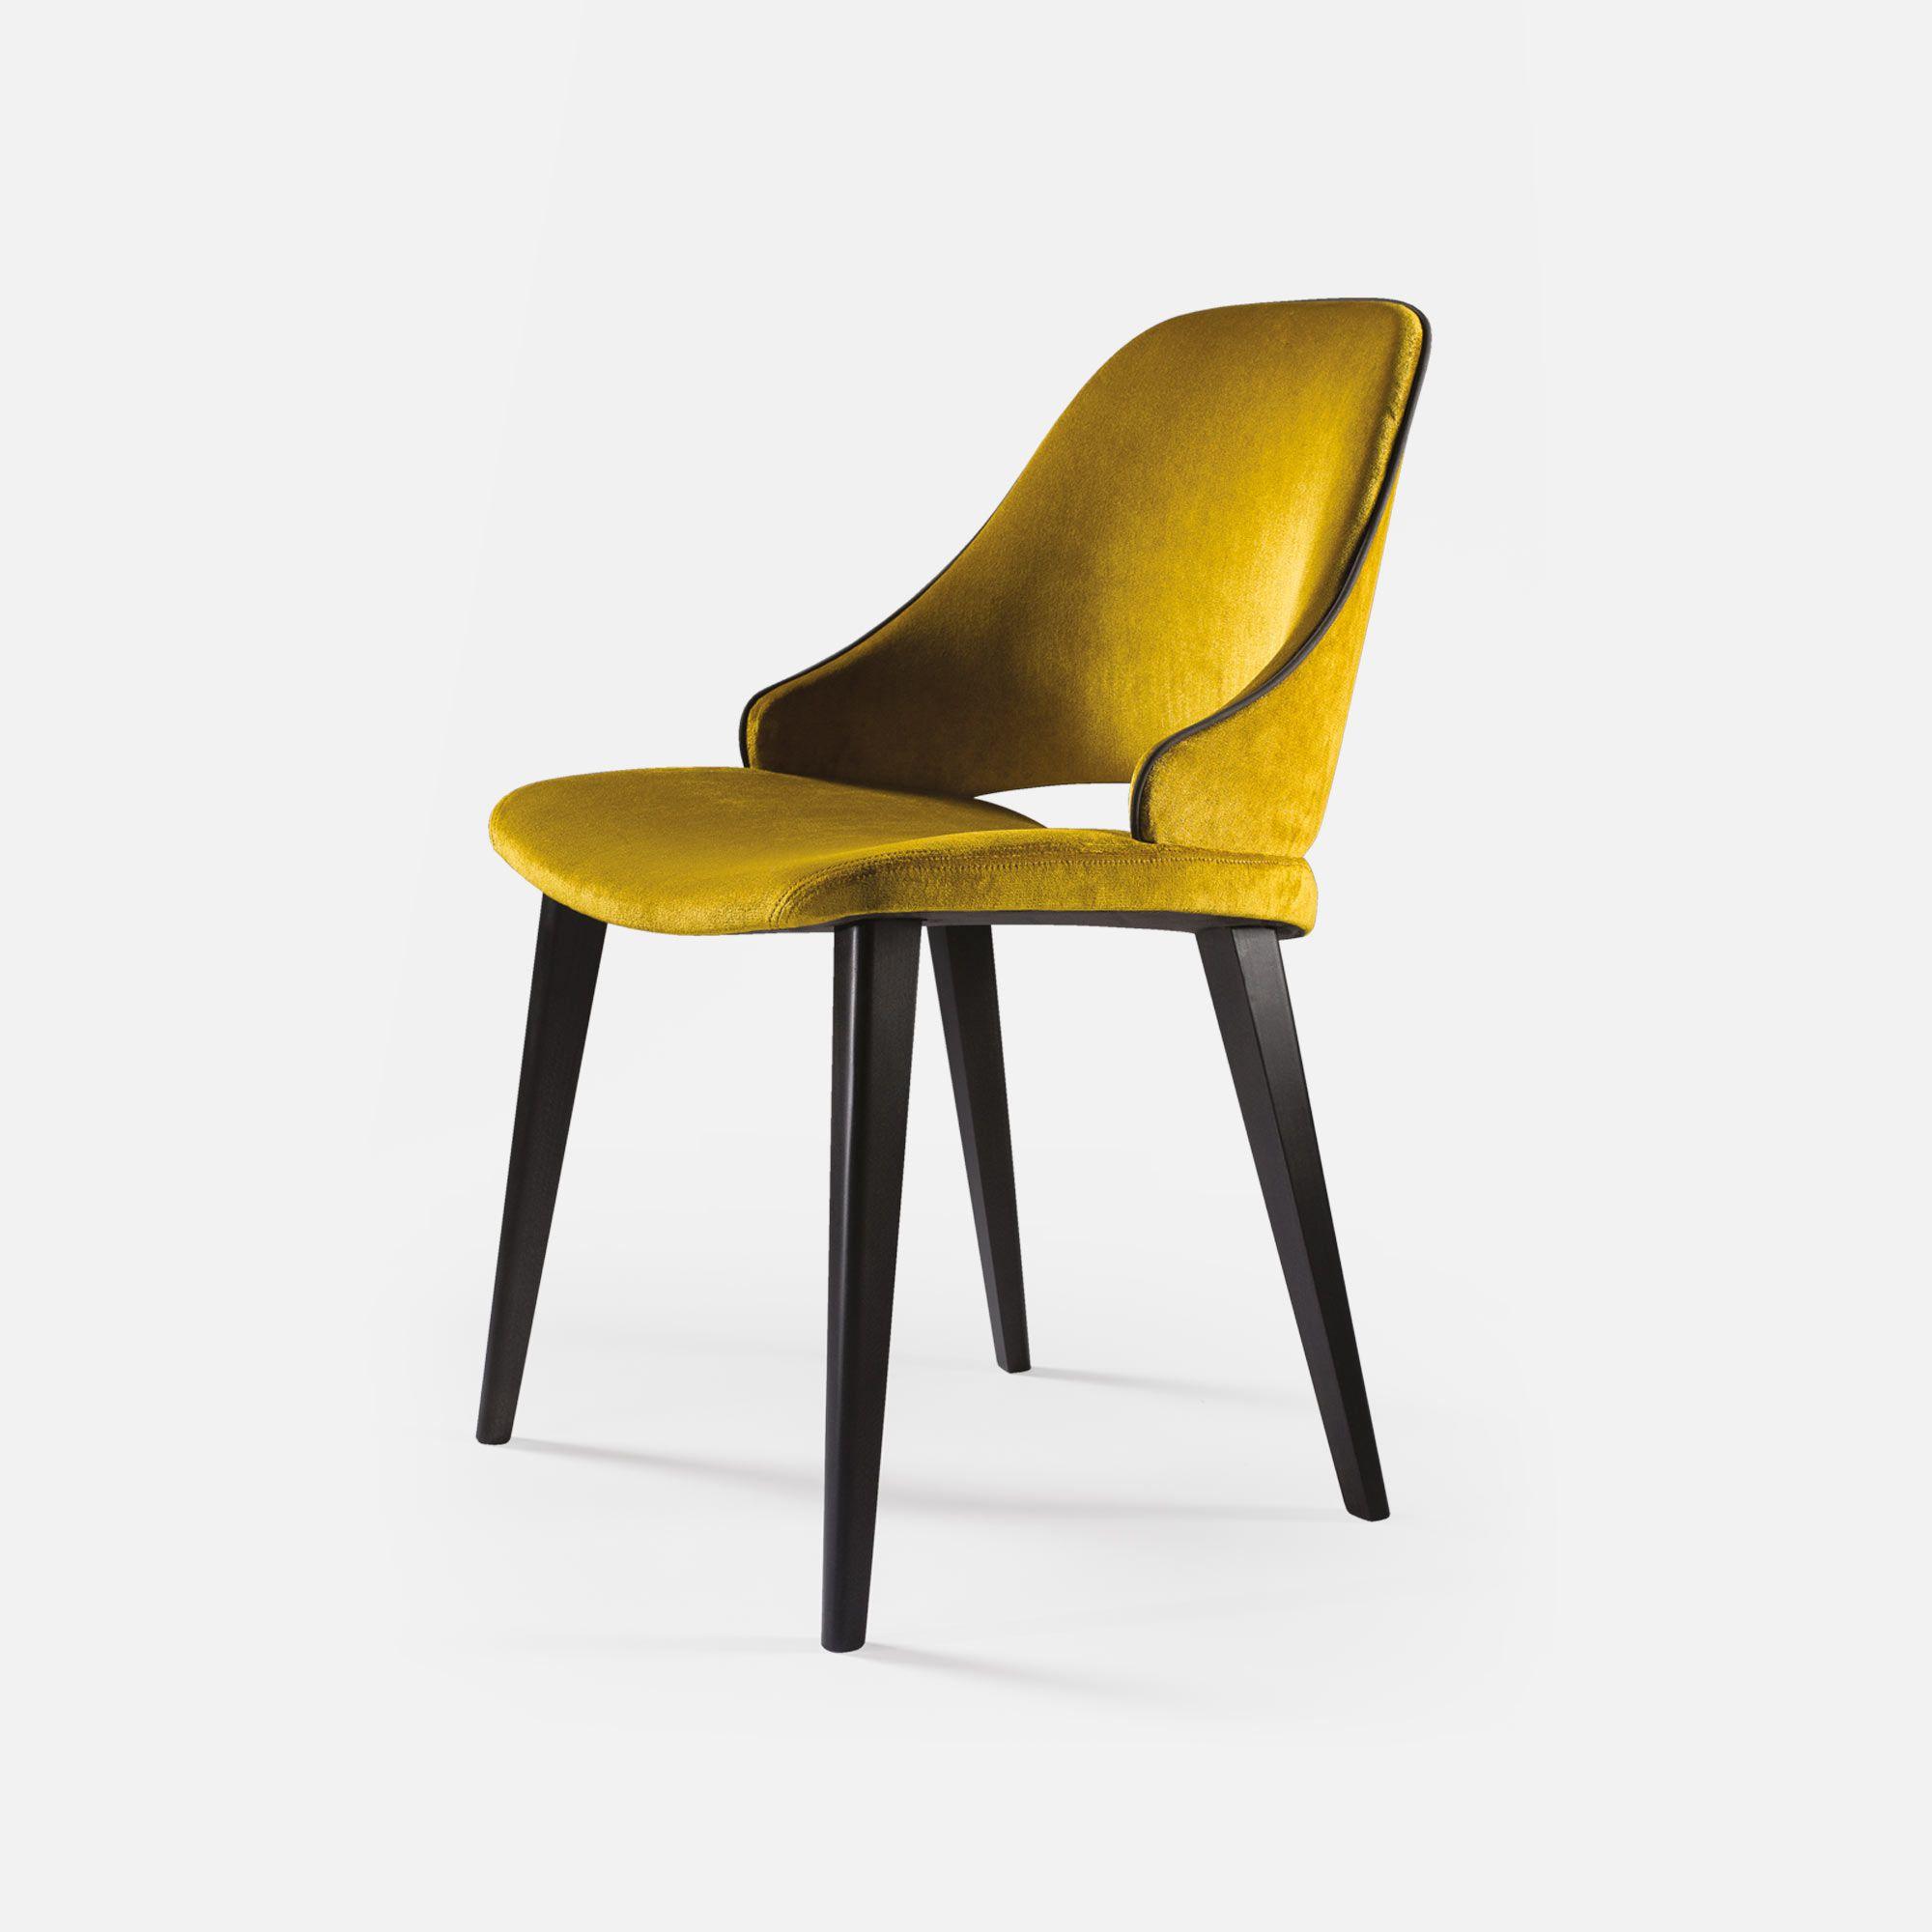 Chair for hotel, restaurant: Nog | Collinet